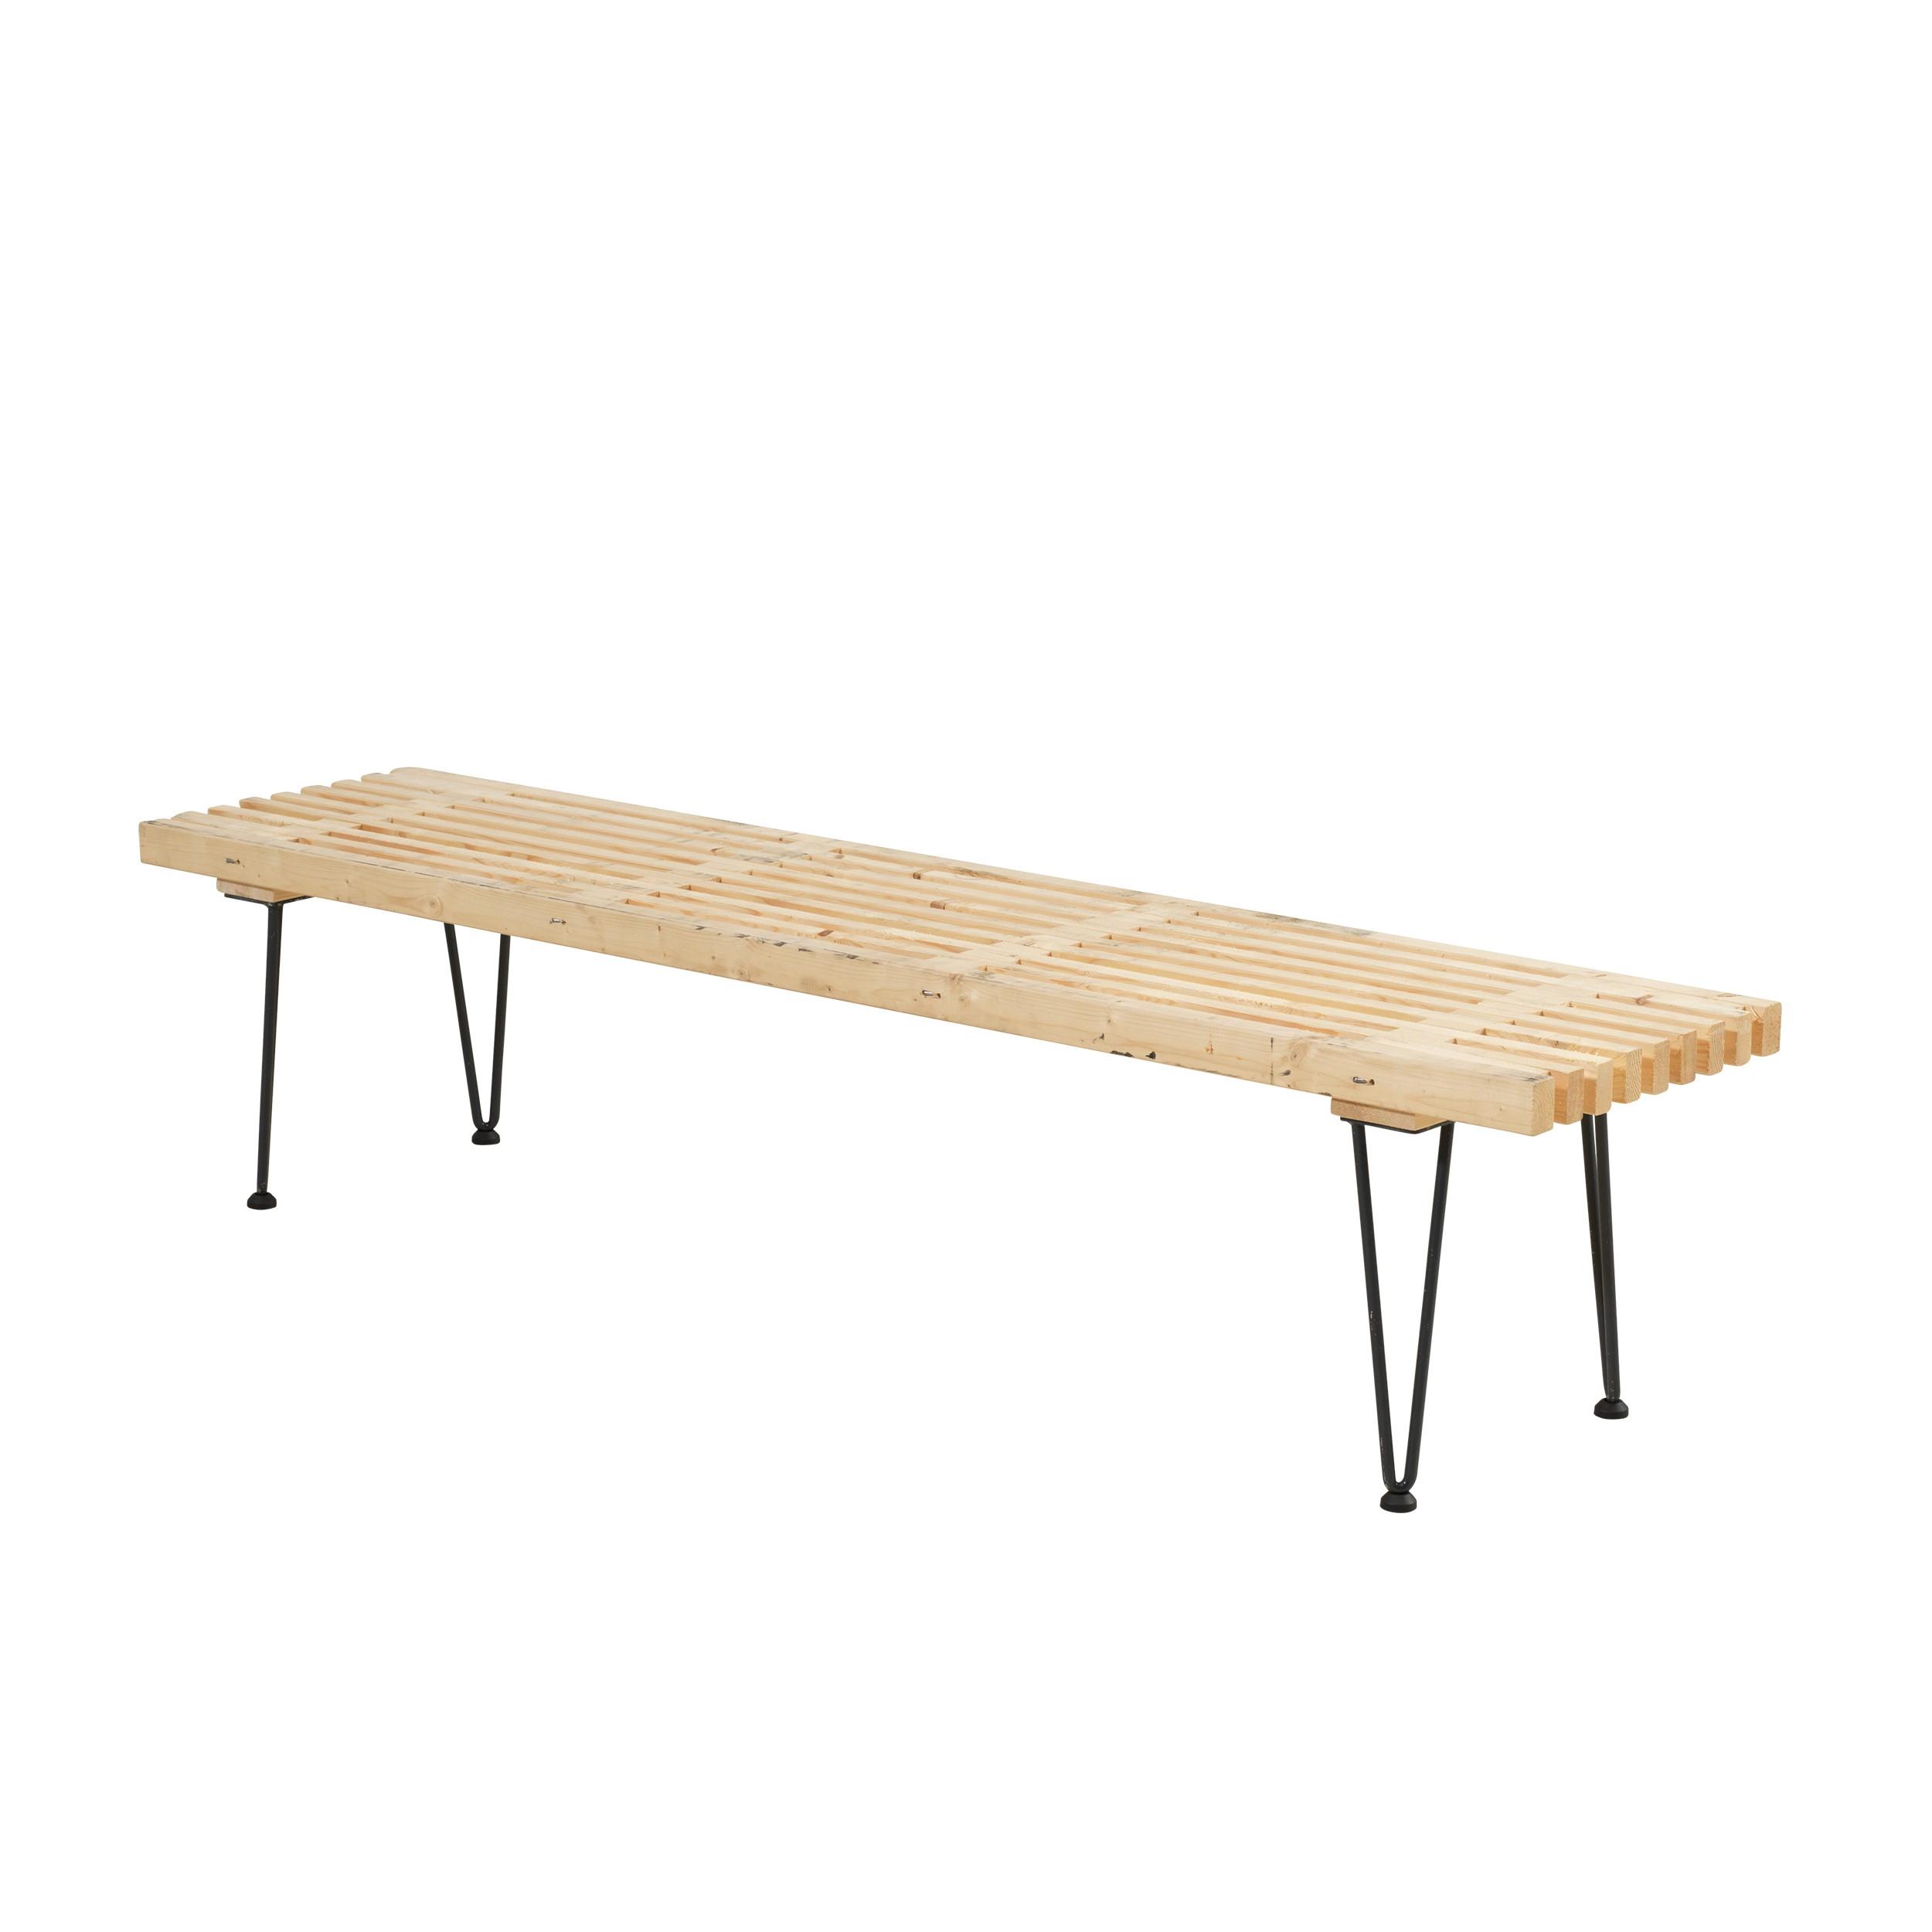 plus dk retro lattenbank gro ebay. Black Bedroom Furniture Sets. Home Design Ideas